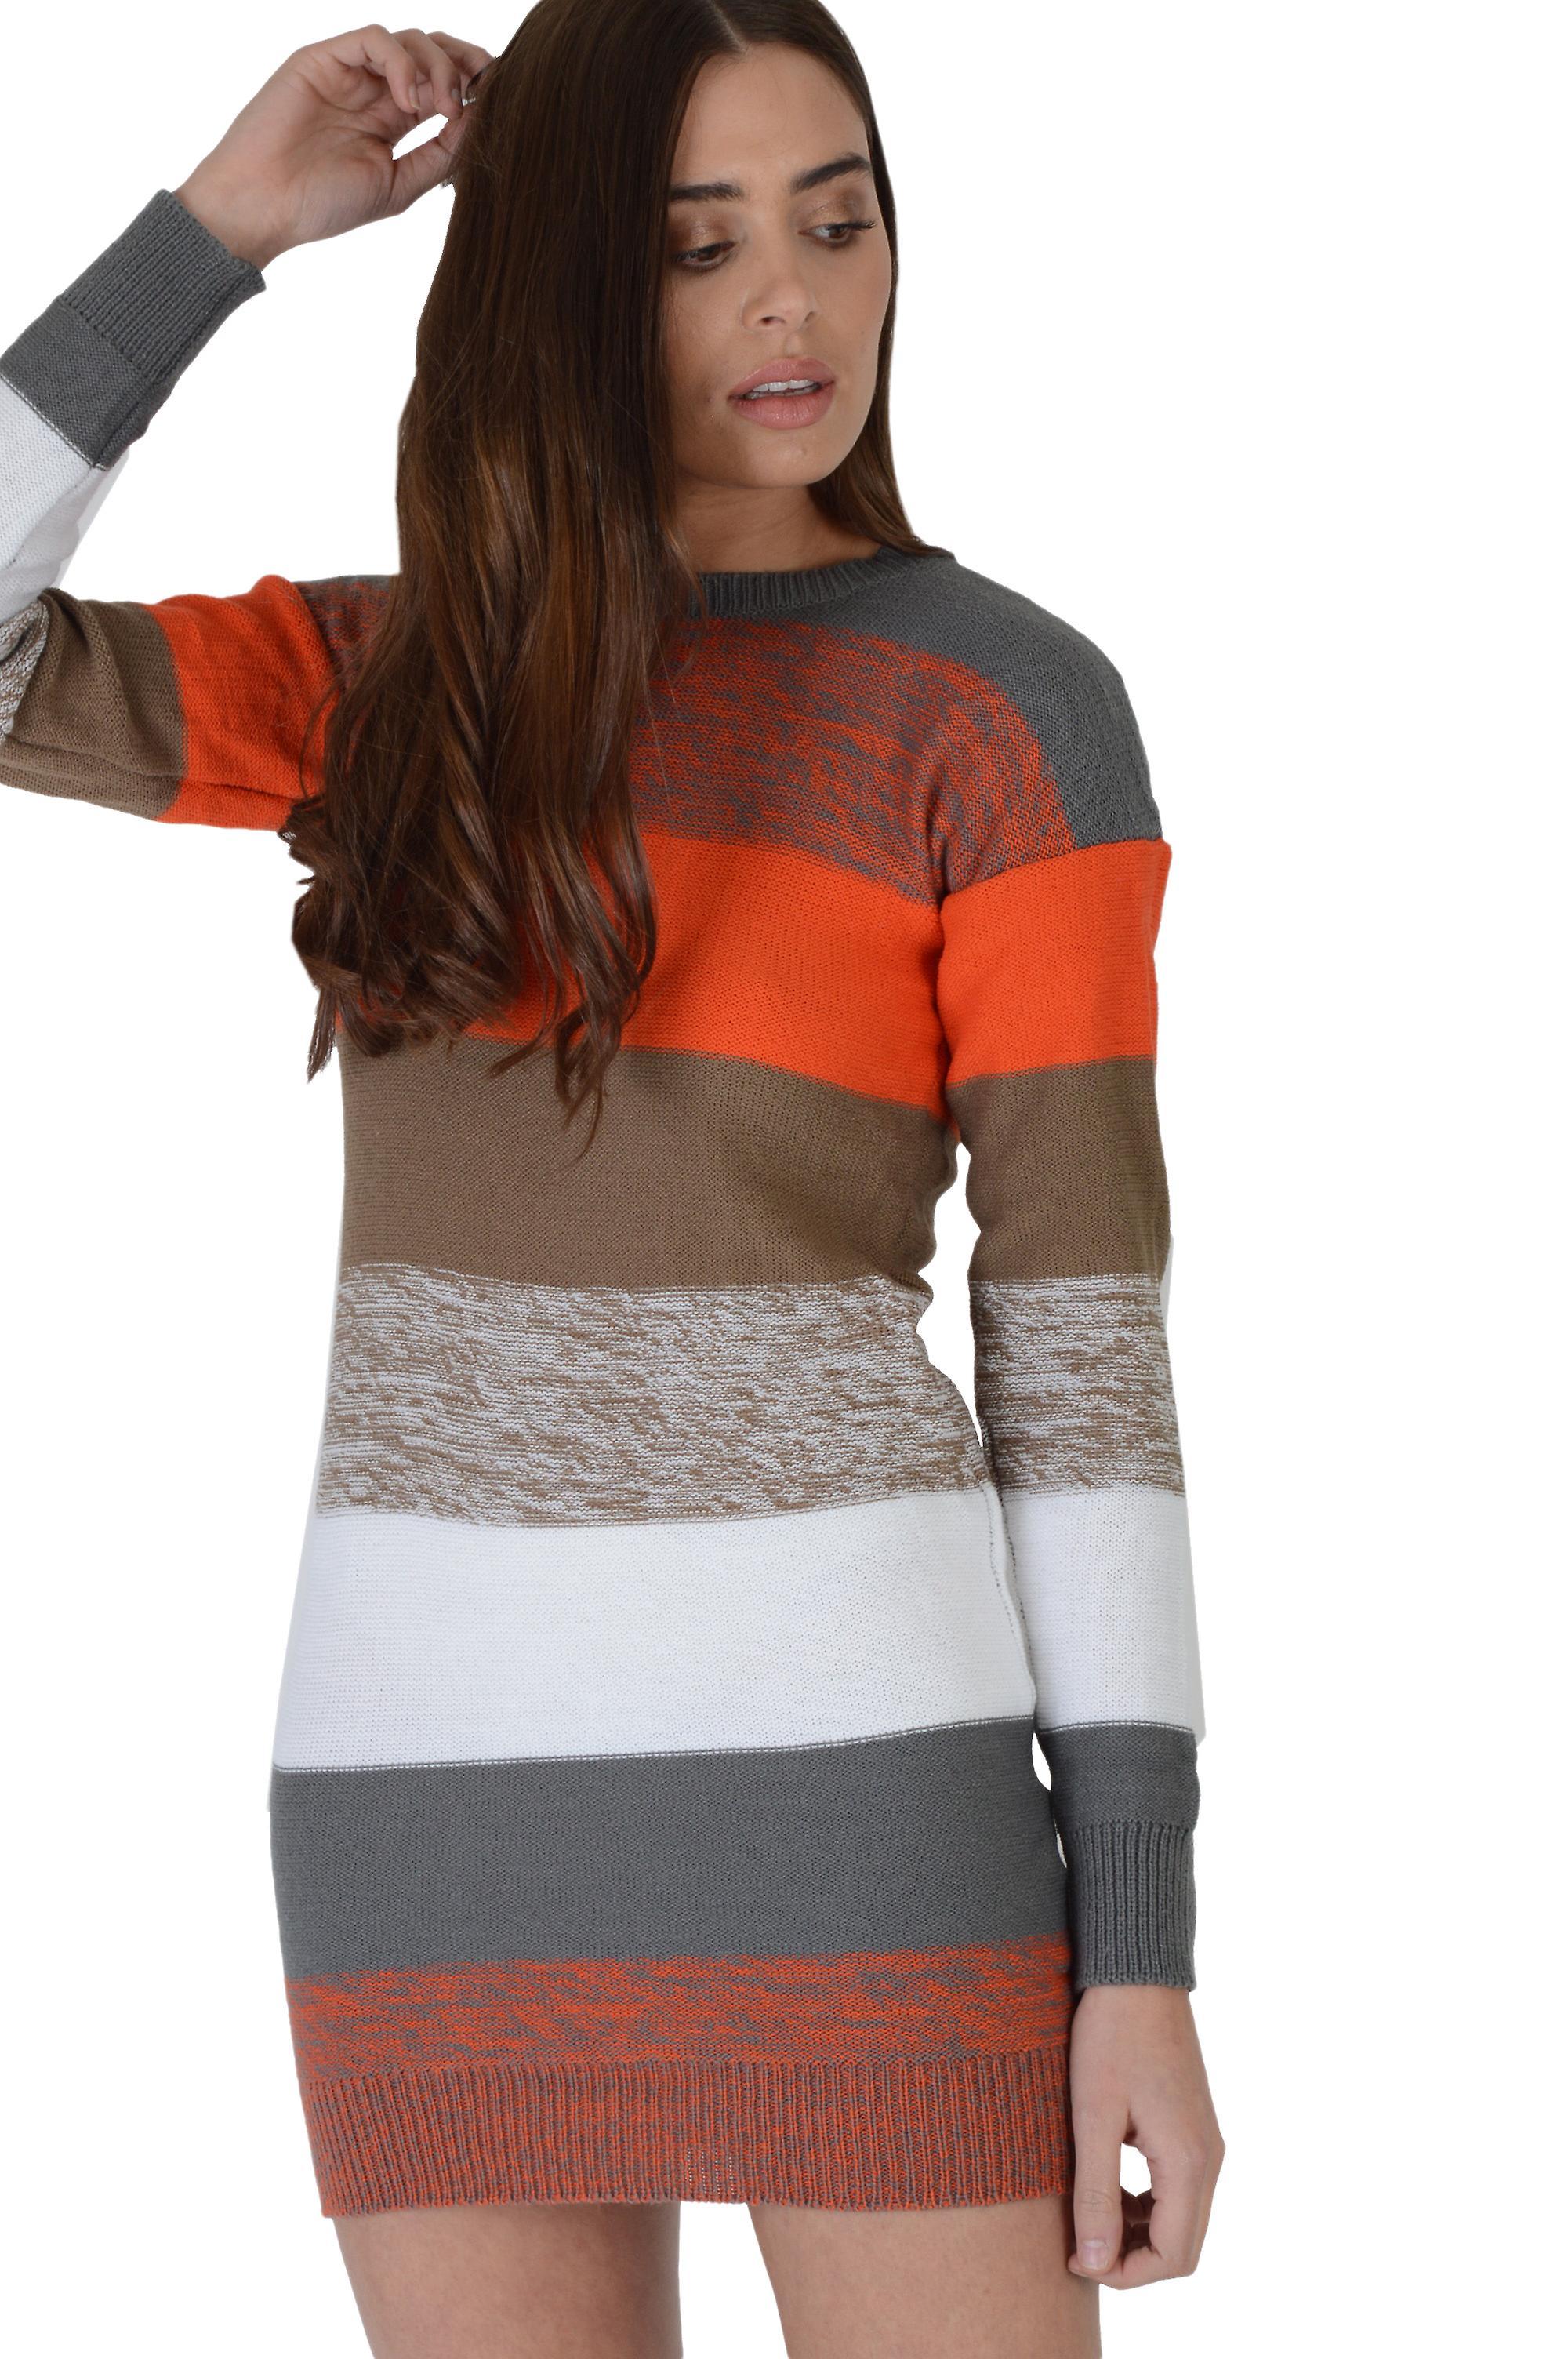 Lovemystyle Petite Long Sleeved Short Stripey Jumper Dress